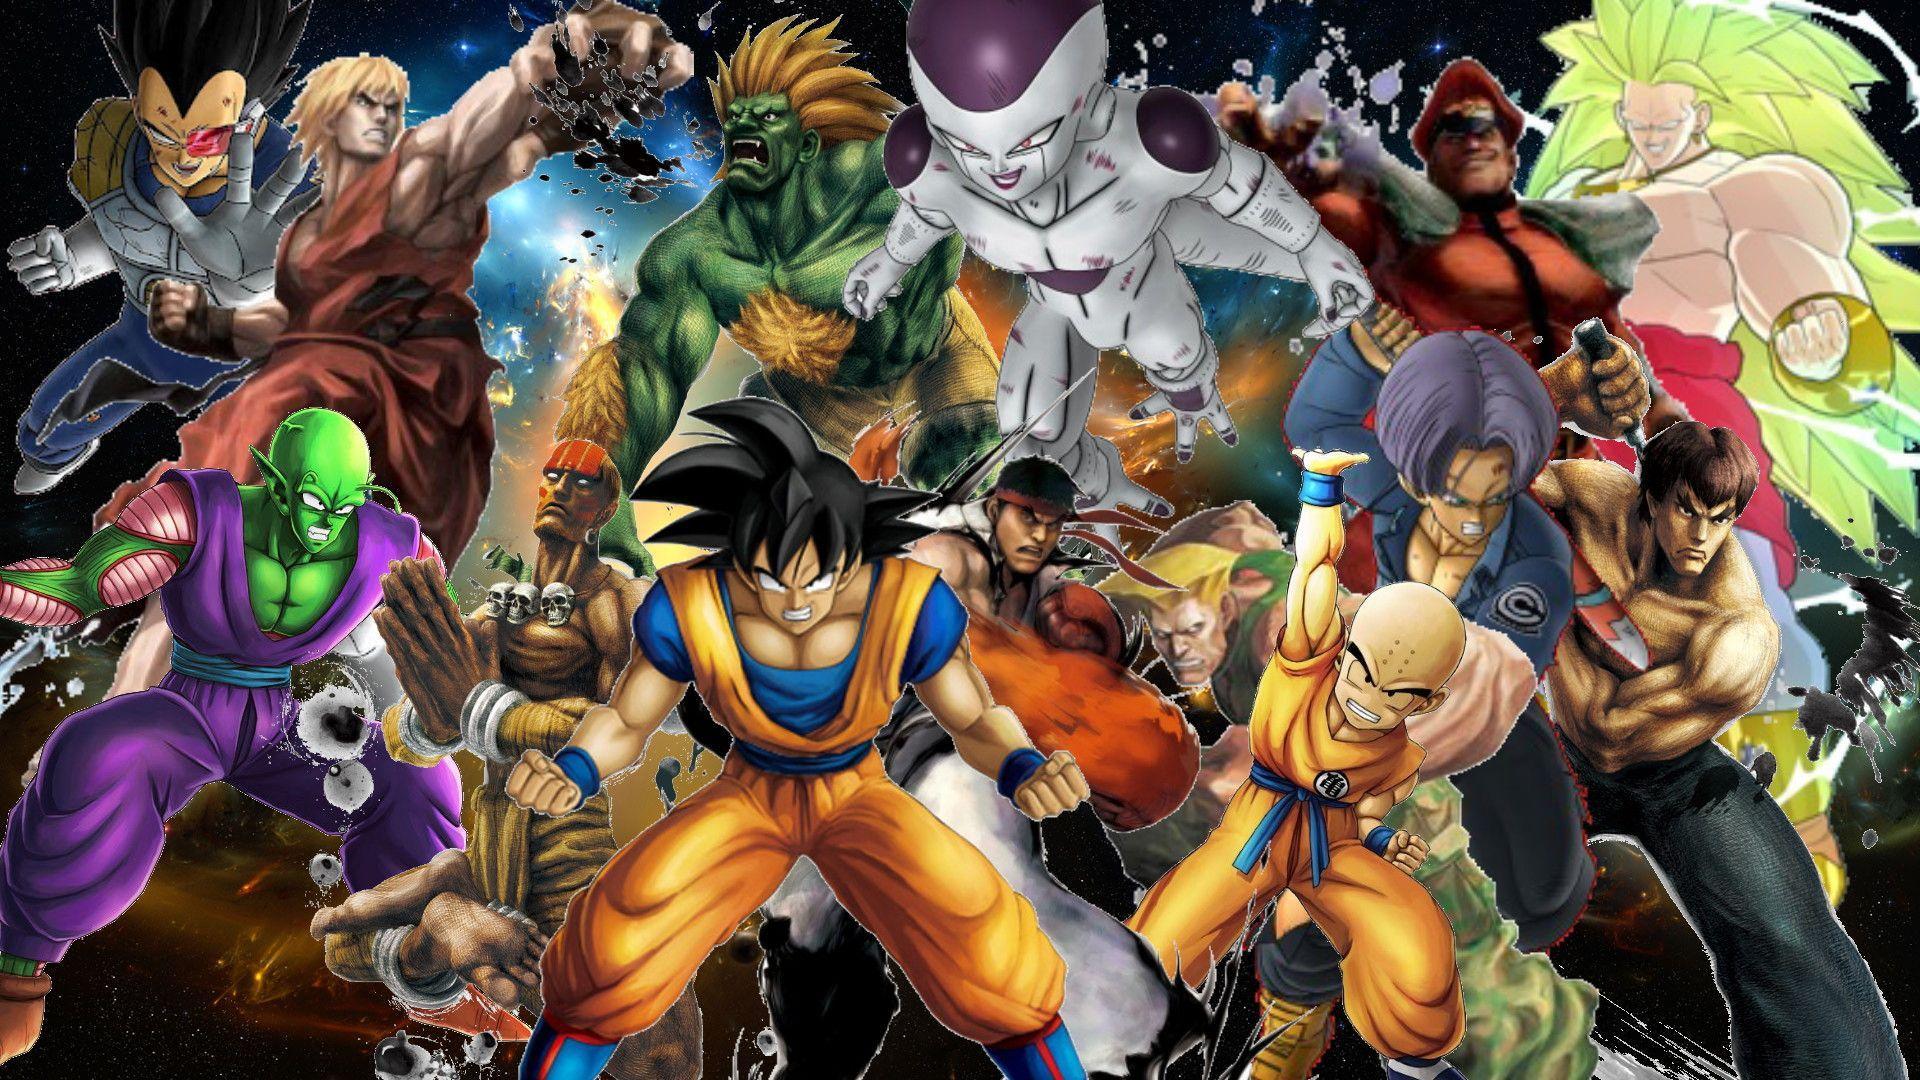 Dragon Ball Hd Wallpapers Top Free Dragon Ball Hd